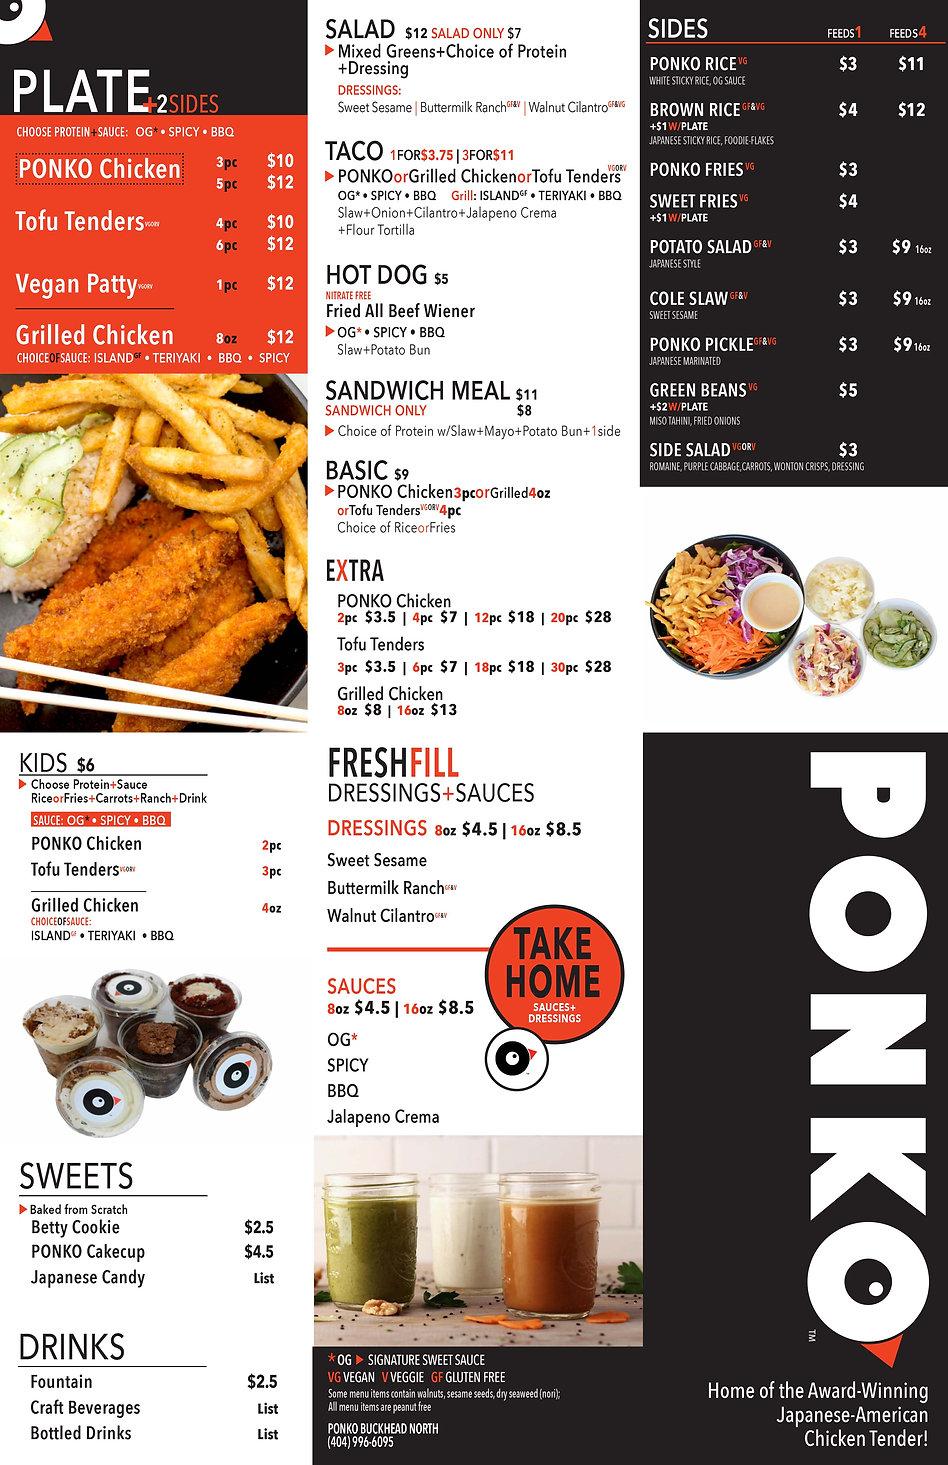 ponko buckhead north To Go 11x8.5V2 21.0701FINAL Website copy.jpg